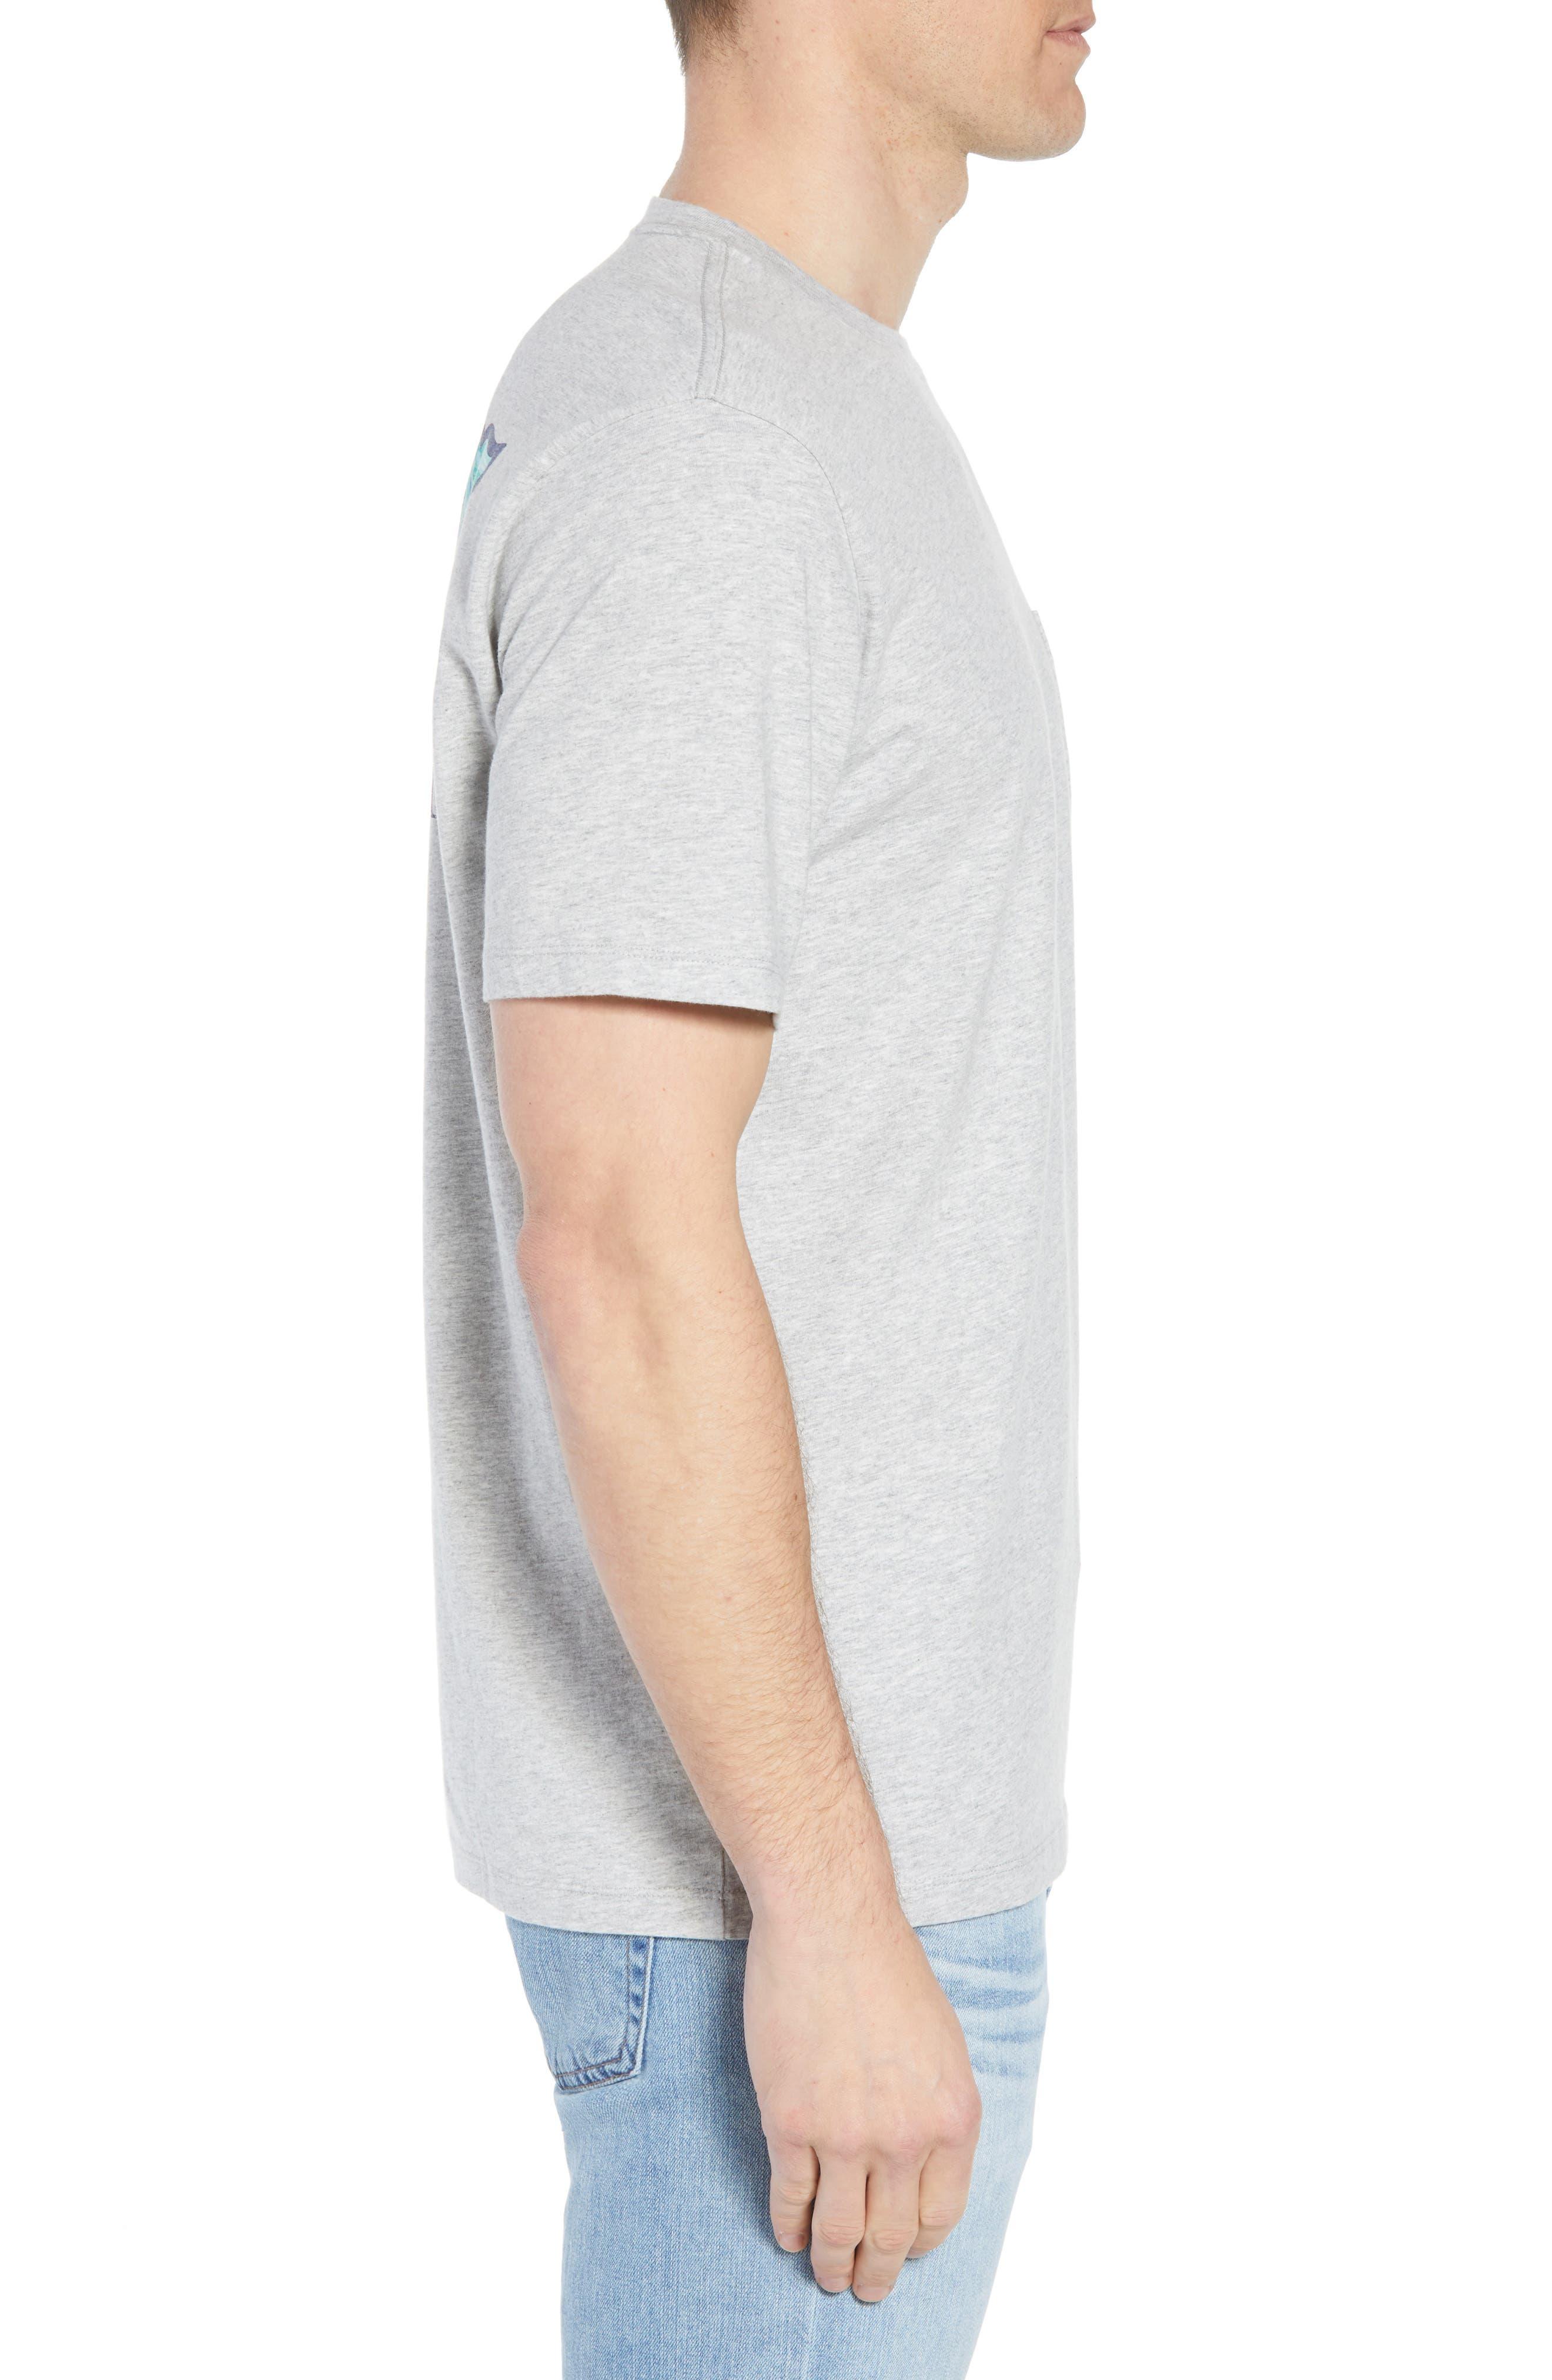 School of Tuna Regular Fit Pocket T-Shirt,                             Alternate thumbnail 3, color,                             Gray Heather